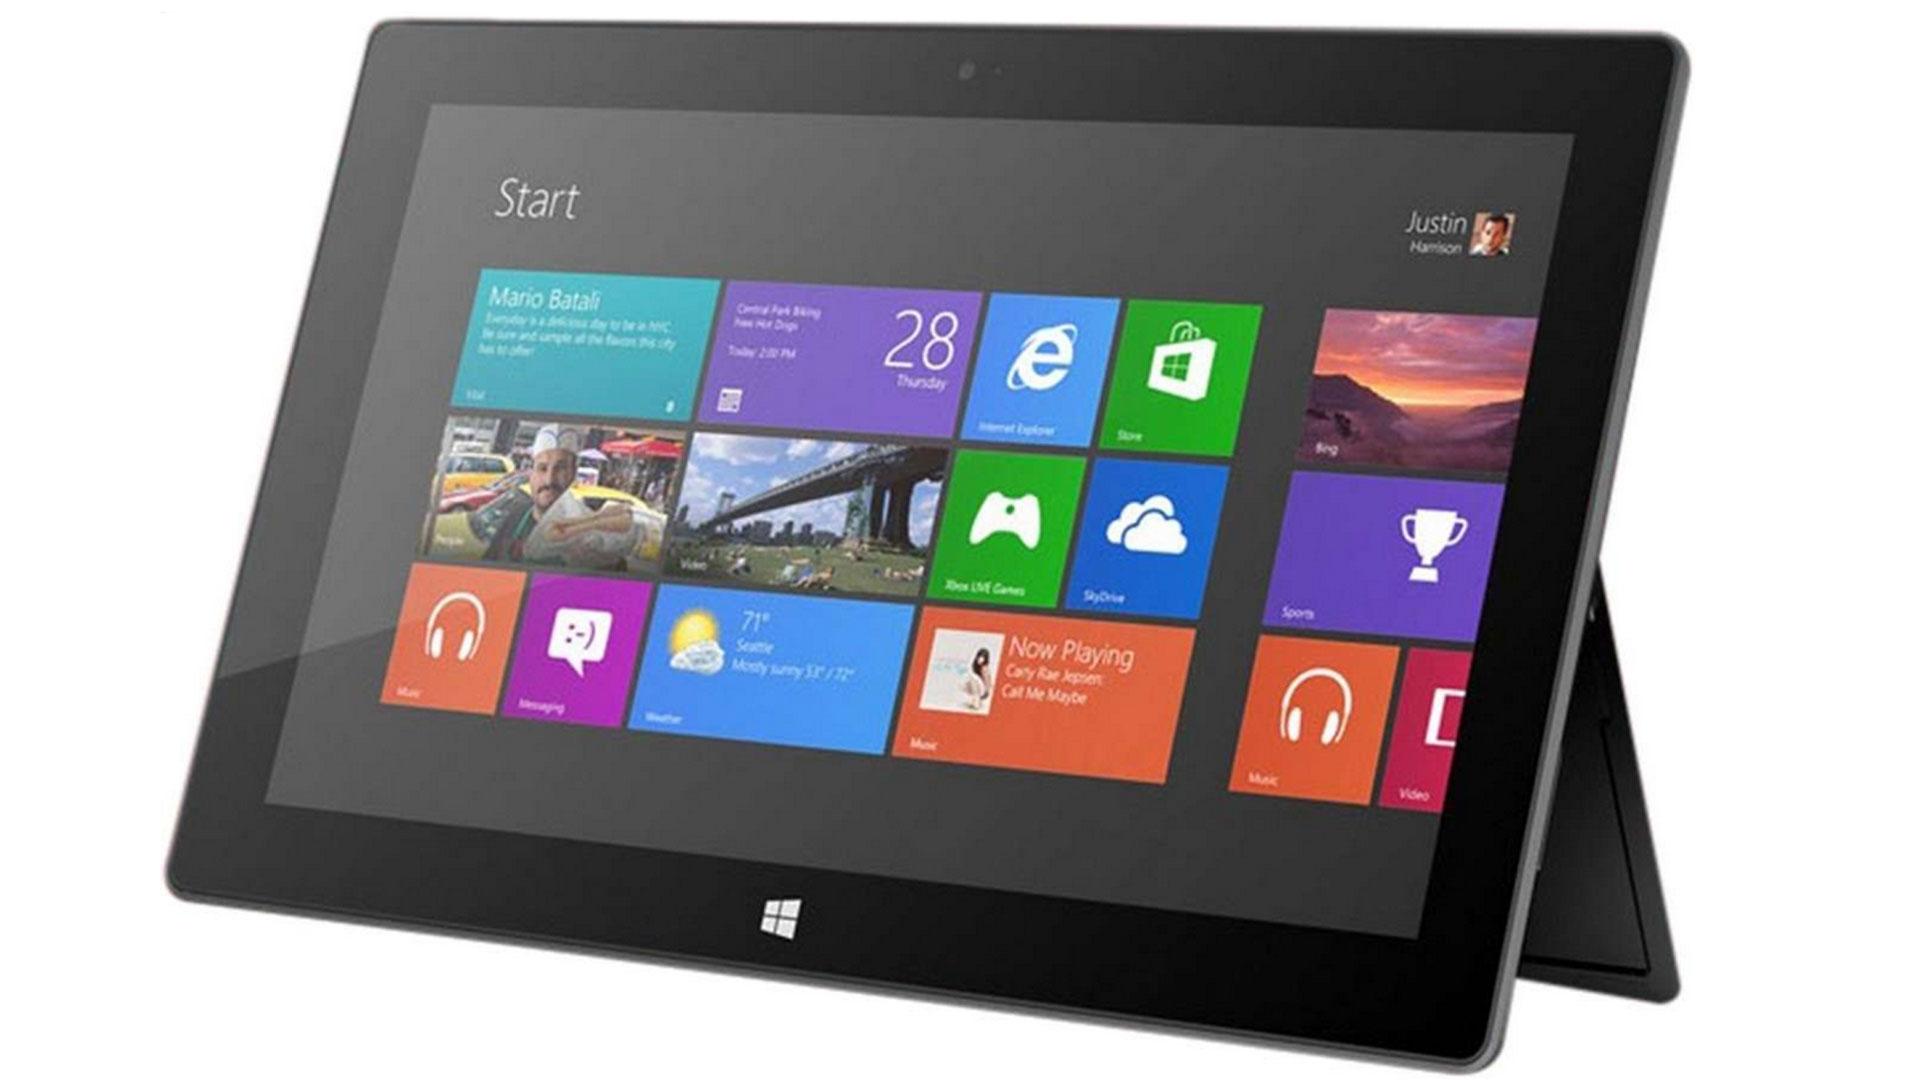 8GB RAM搭載 Surface Pro 2 価格は10万円台?   グローバル ...